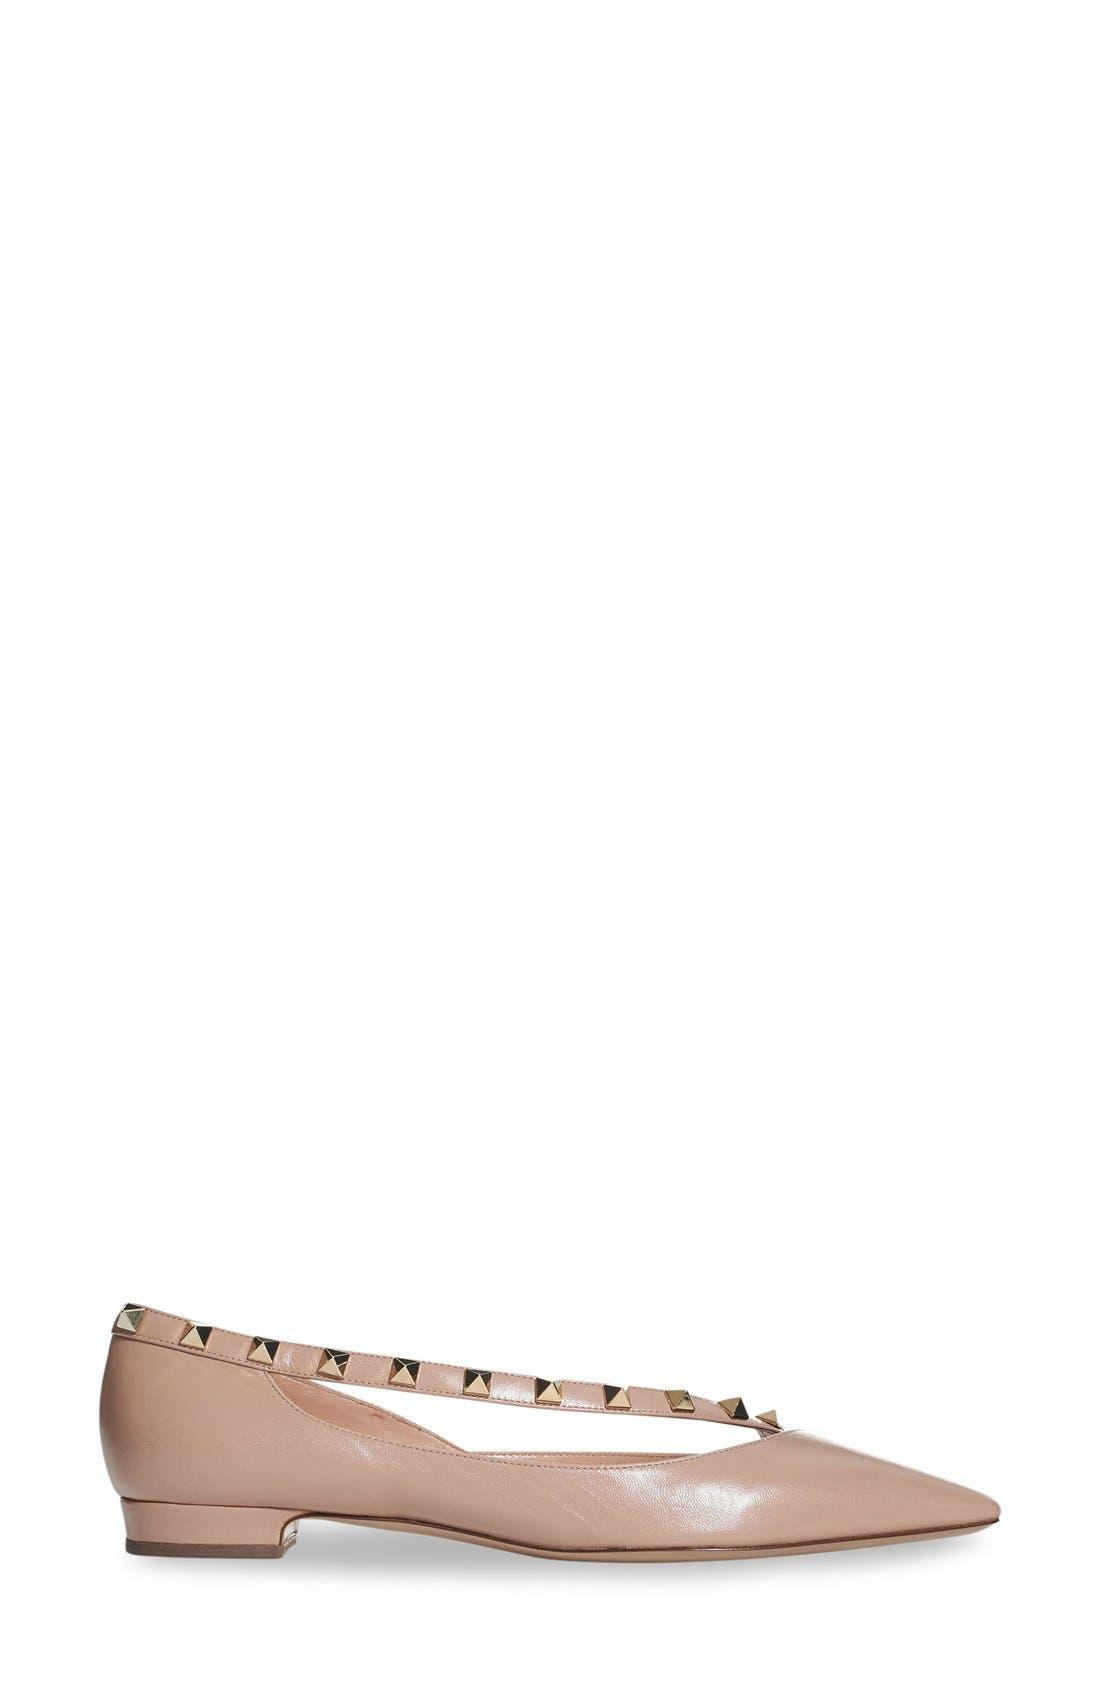 'Rockstud' Demi d'Orsay Flat,                             Alternate thumbnail 3, color,                             Nude Leather